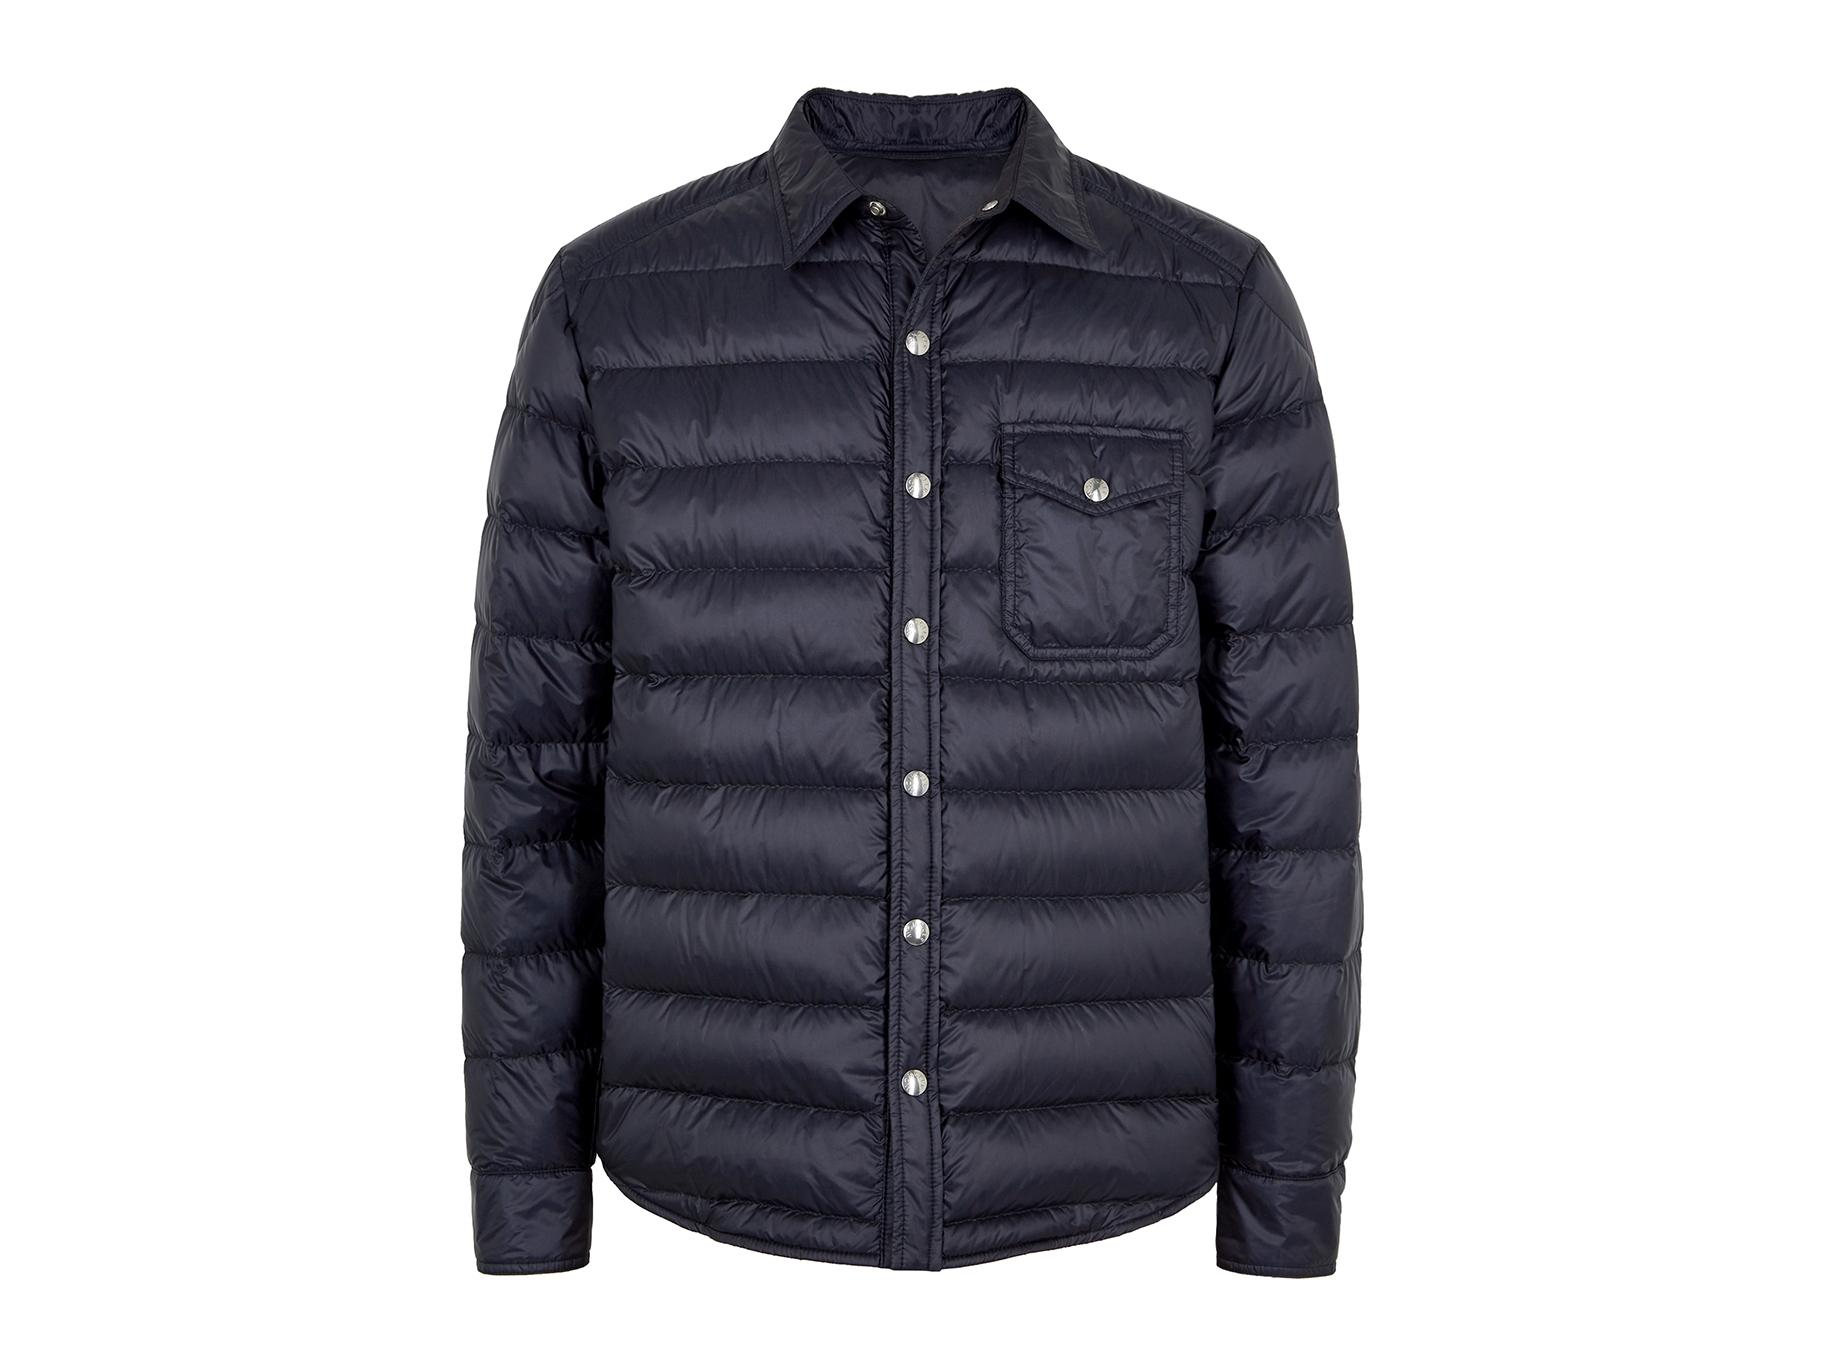 e16c66457ef3 Moncler Alancourt navy quilted shell jacket - Harvey Nichols